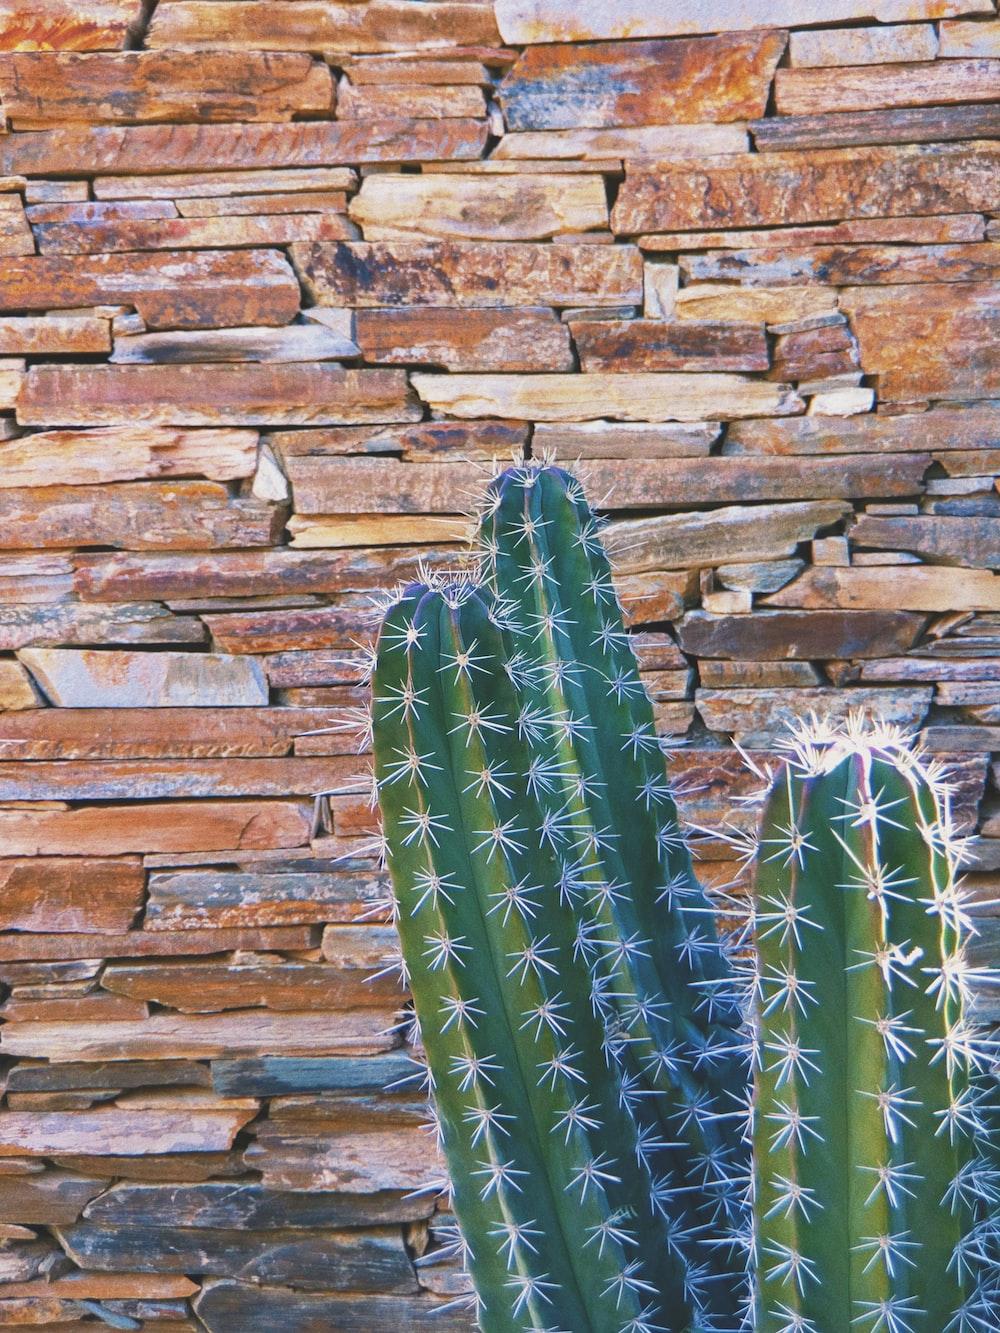 green cactus on brown brick wall